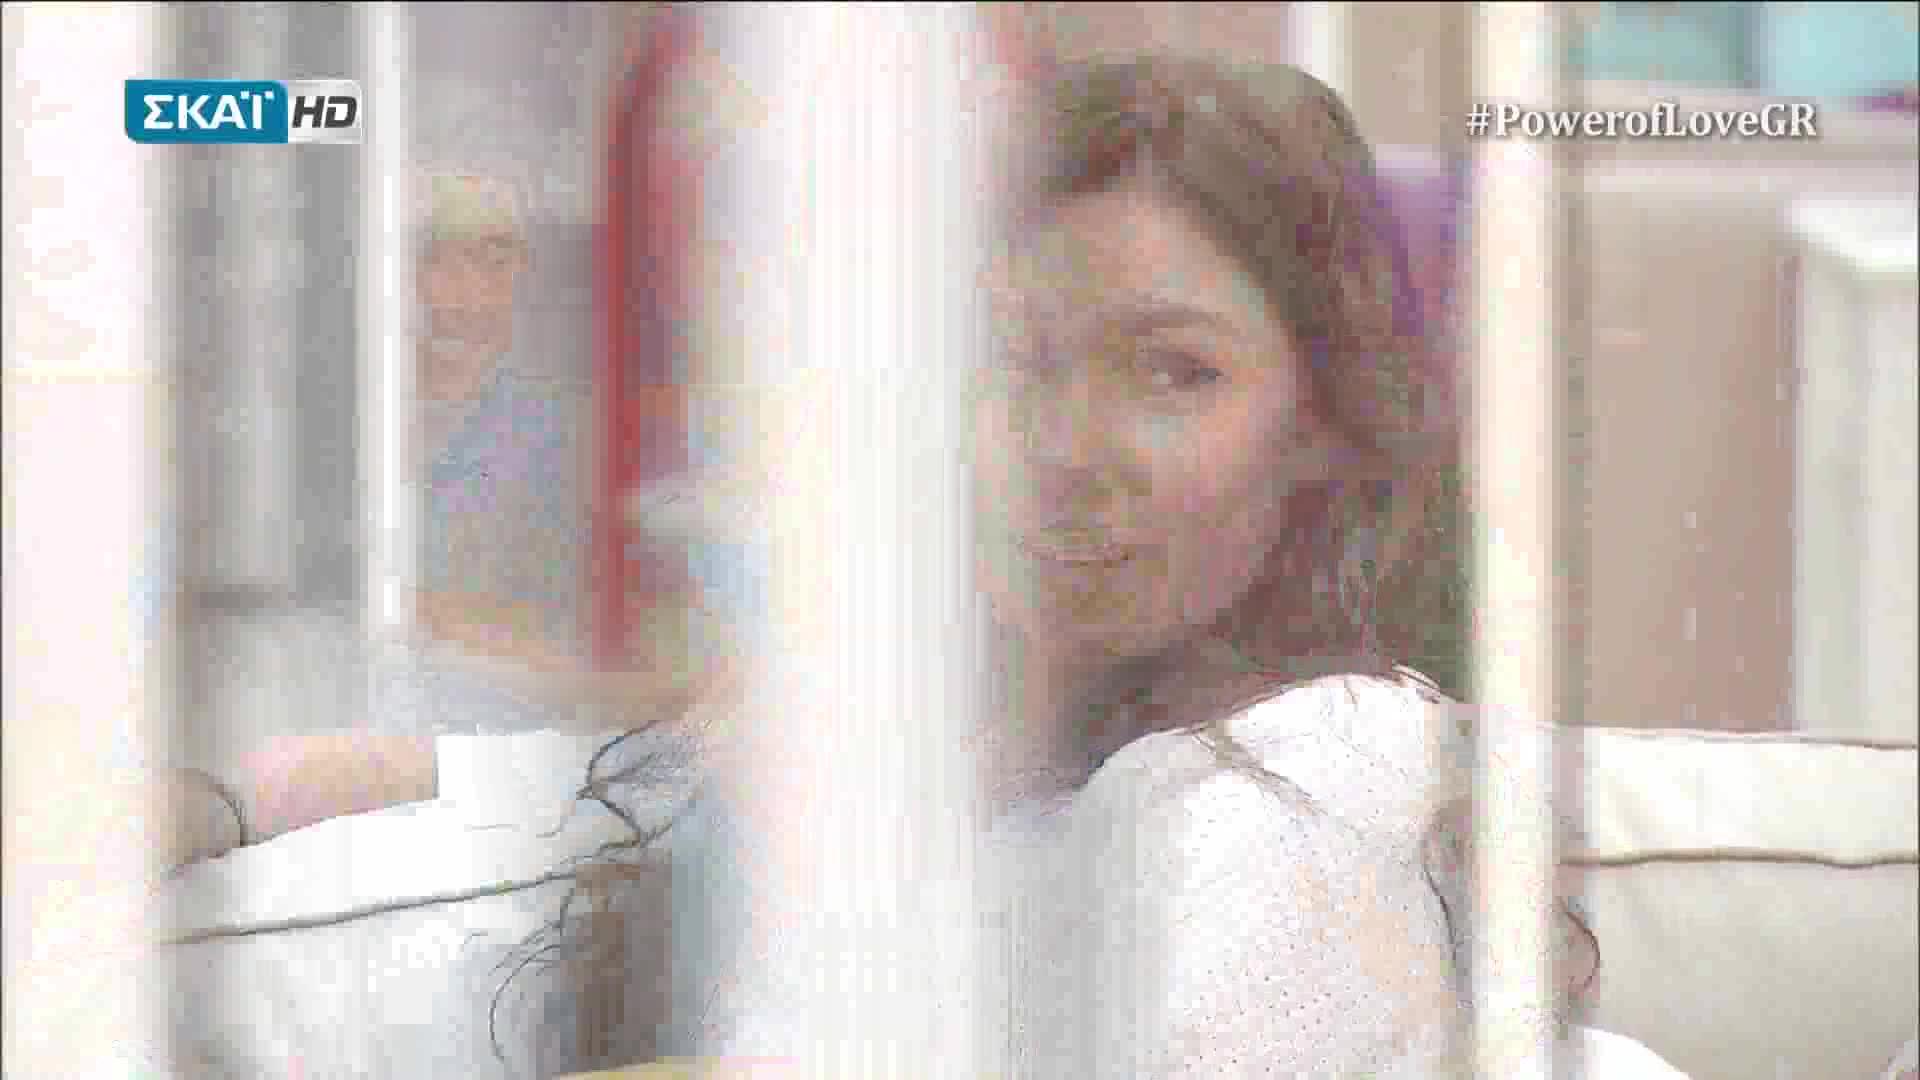 Power Of Love: Η επιστροφή της Βίβιαν και η αποκάλυψη για την προσωπική της ζωή